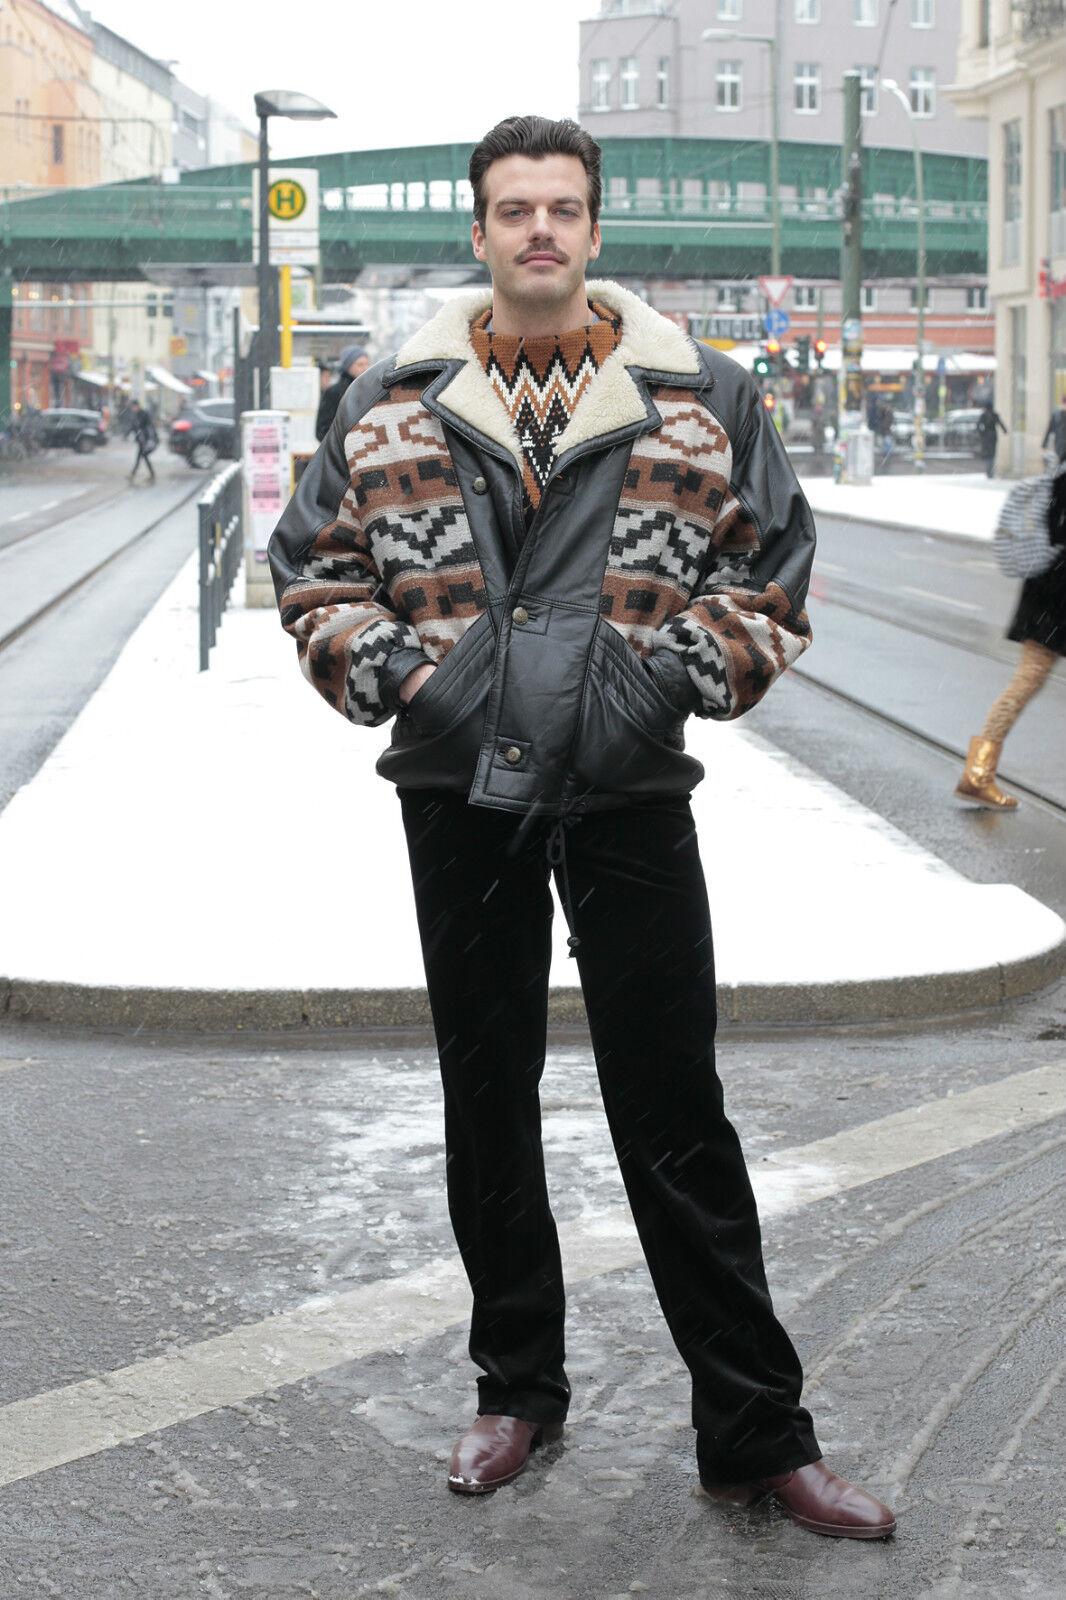 VEB Uomo Abbigliamento Dresda velluto DDR Pantaloni Pants Nero 60er True Vintage 60´s